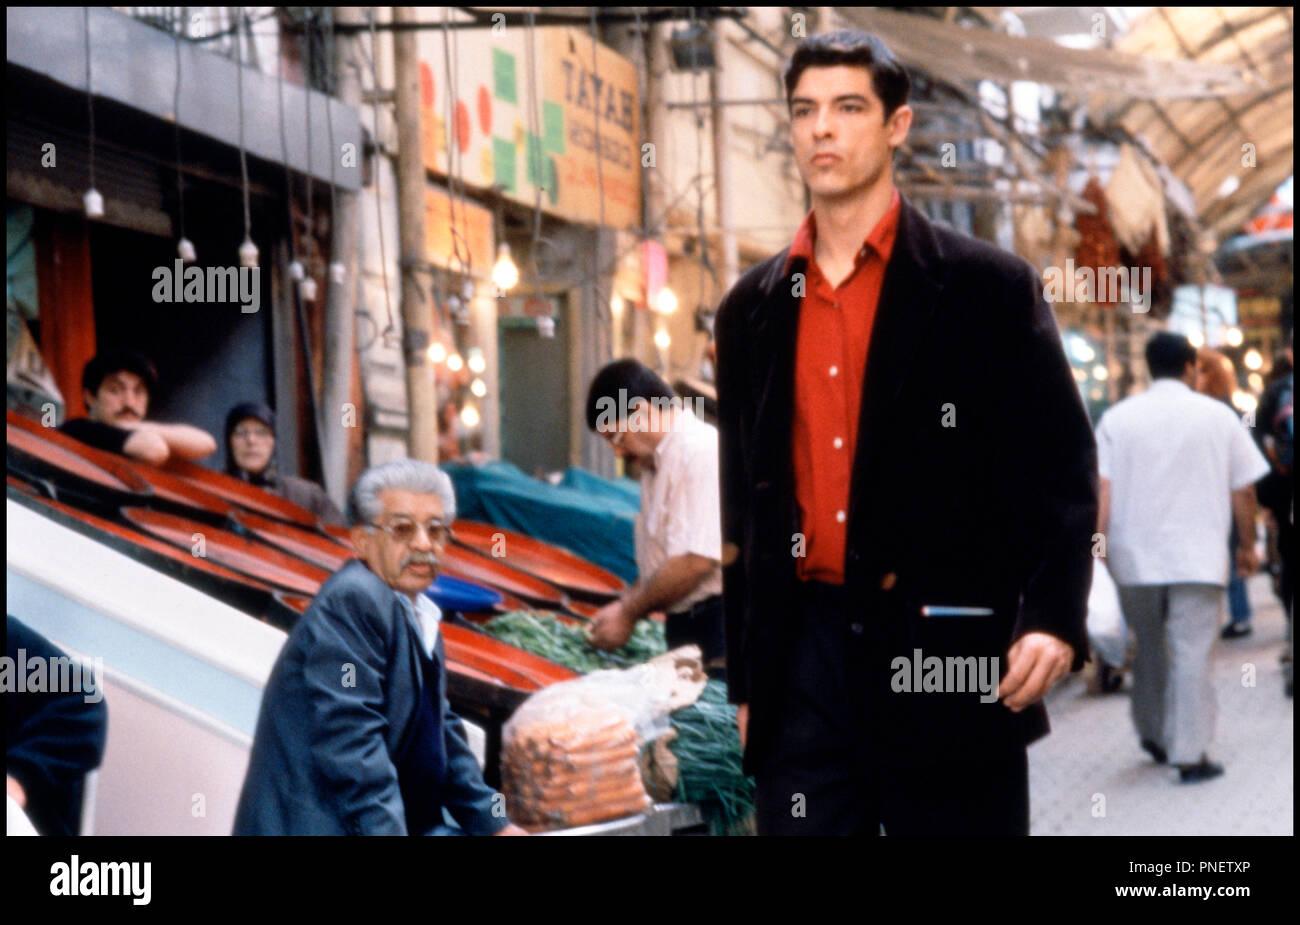 Mehmet gunsur dating